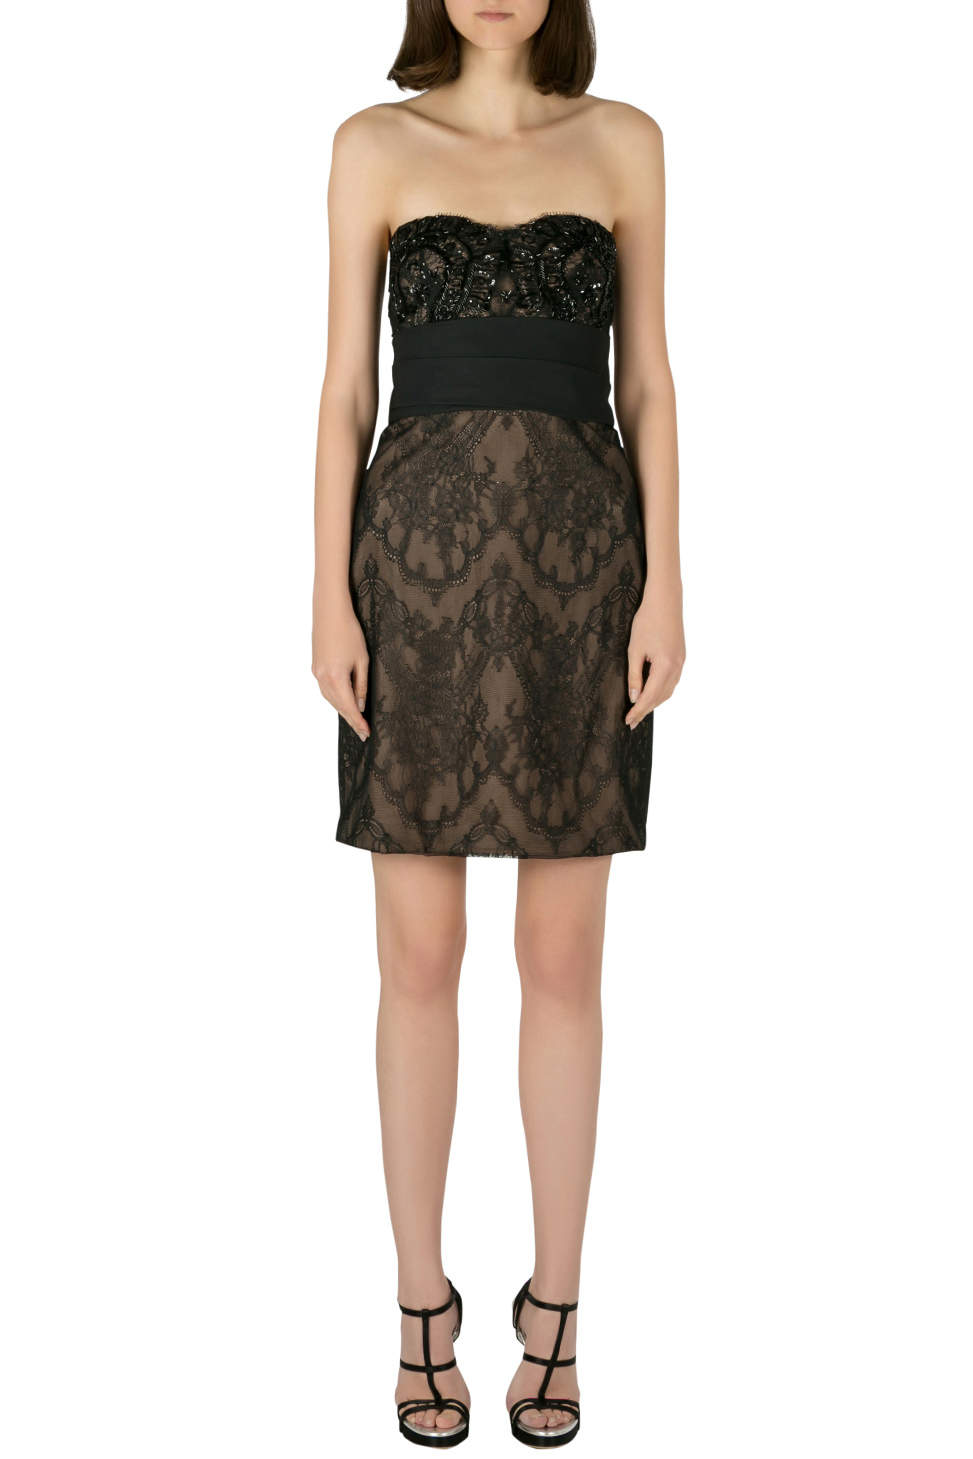 Marchesa Notte Black Chantilly Lace Embellished Bodice Strapless Pencil Dress S